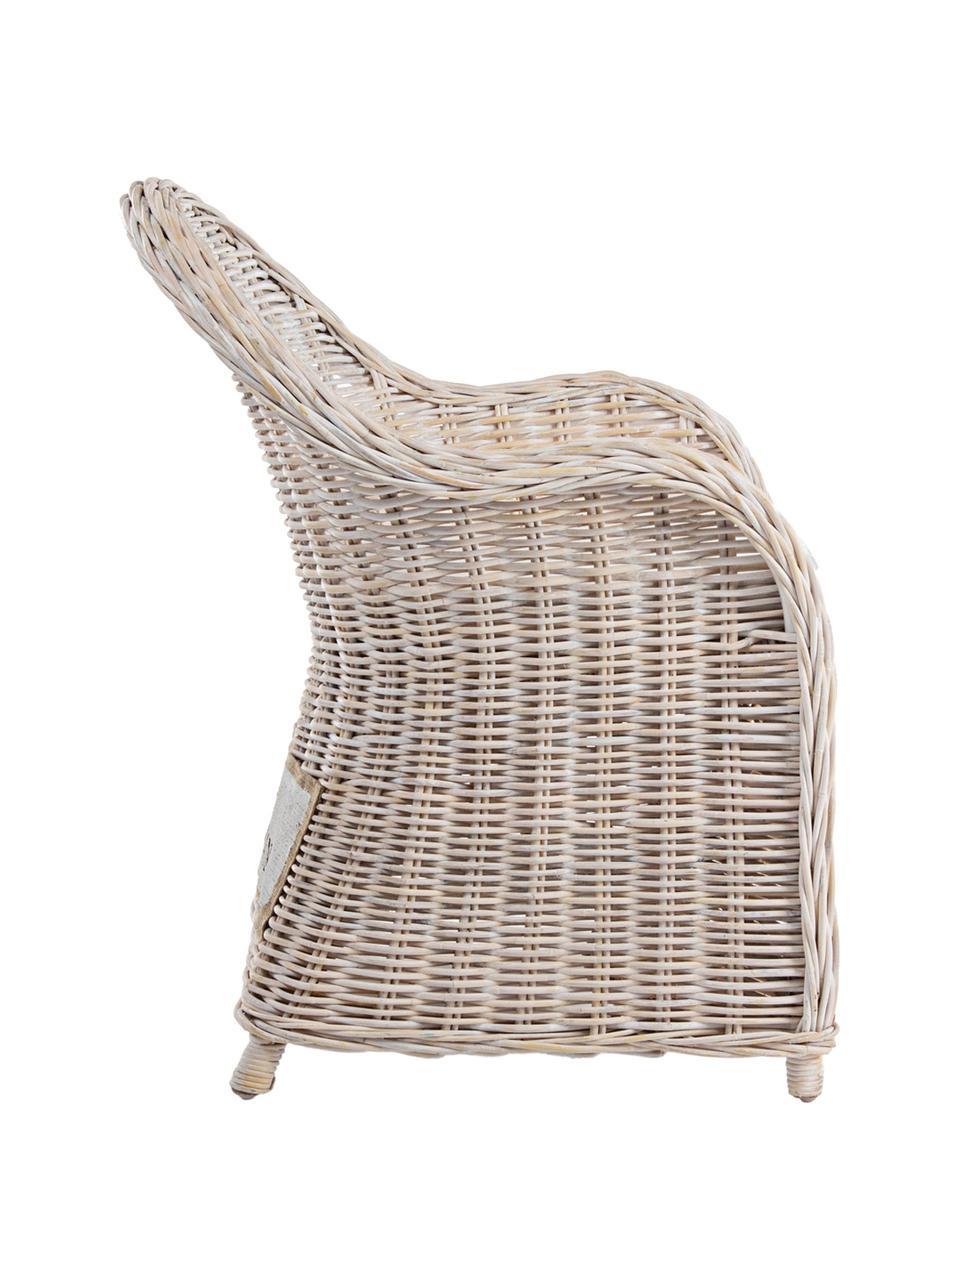 Ratanová židle spodručkami a podsedákem Martin, Ratan, bílá